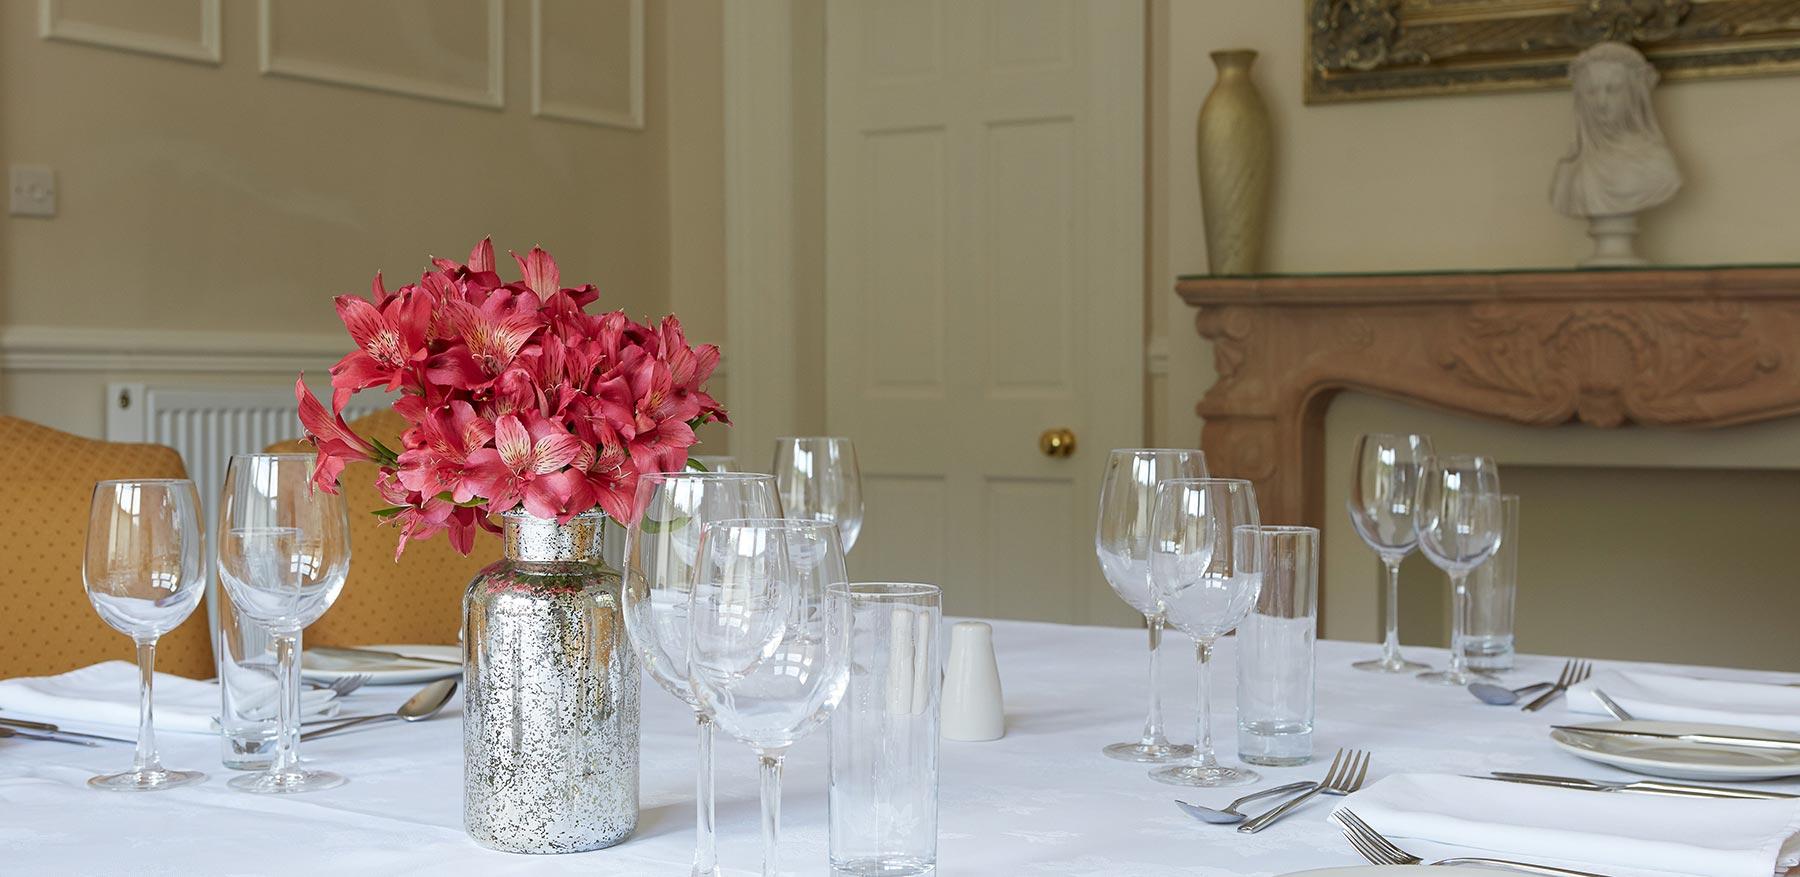 Portland-House-1870-dining-room-celebration-2